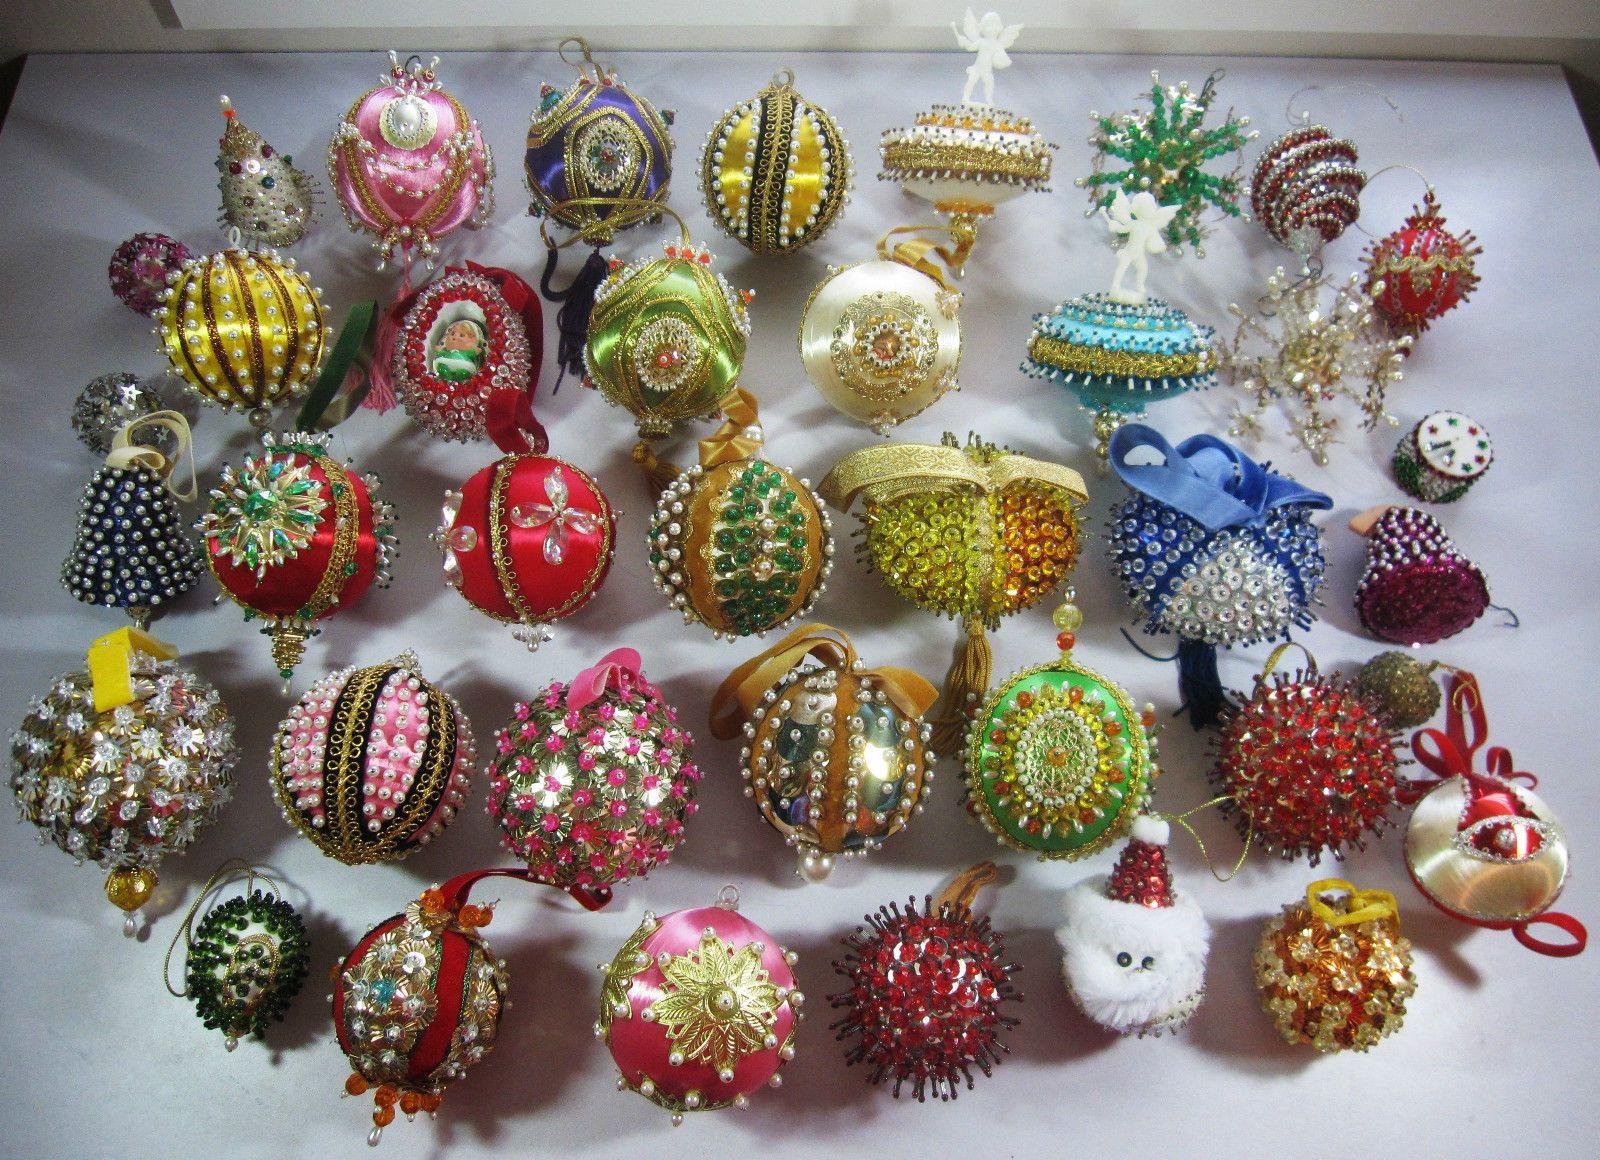 38 Vintage Sequin Beaded Satin Foam Ball Handmade Christmas Ornaments Lot Beaded Christmas Ornaments Fabric Christmas Ornaments Christmas Ornaments Homemade